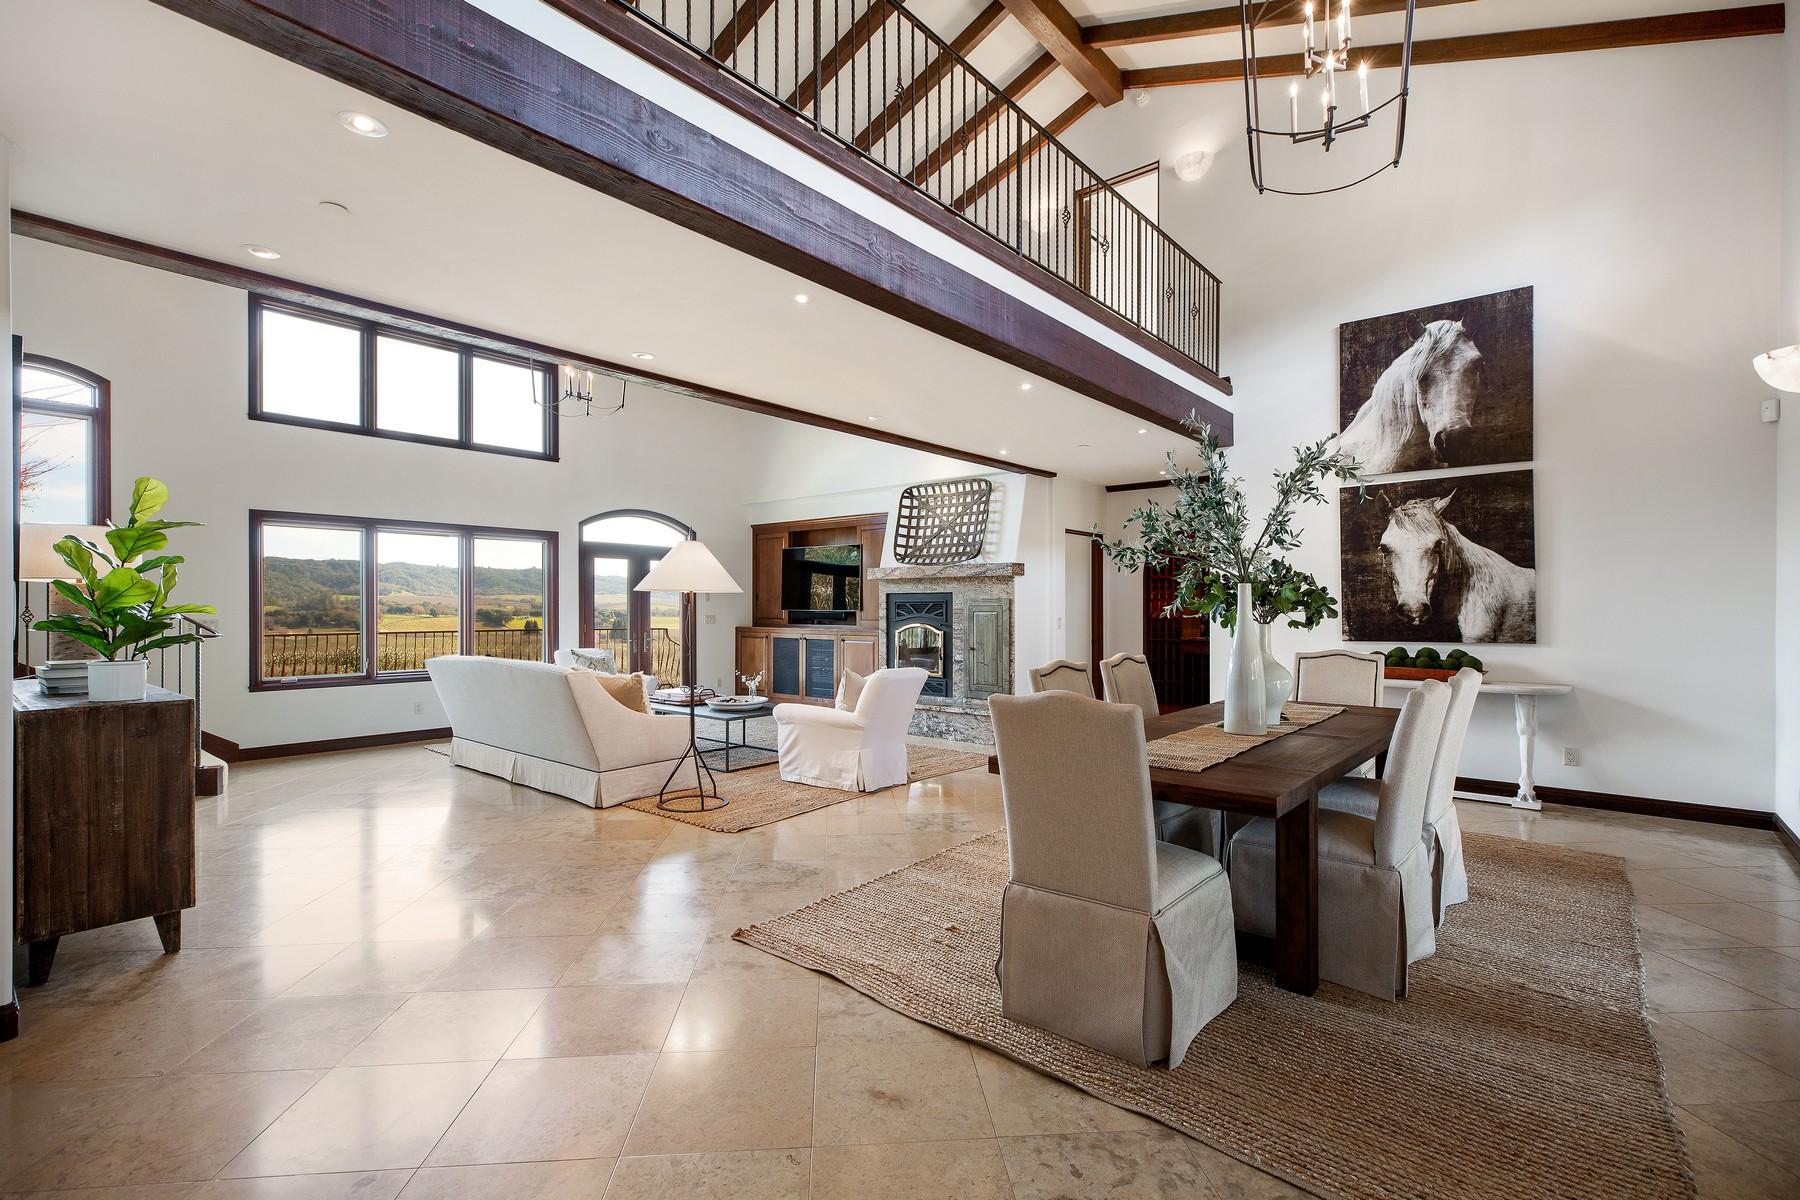 Single Family Homes for Active at Healdsburg Heaven 5959 West Dry Creek Road Healdsburg, California 95448 United States